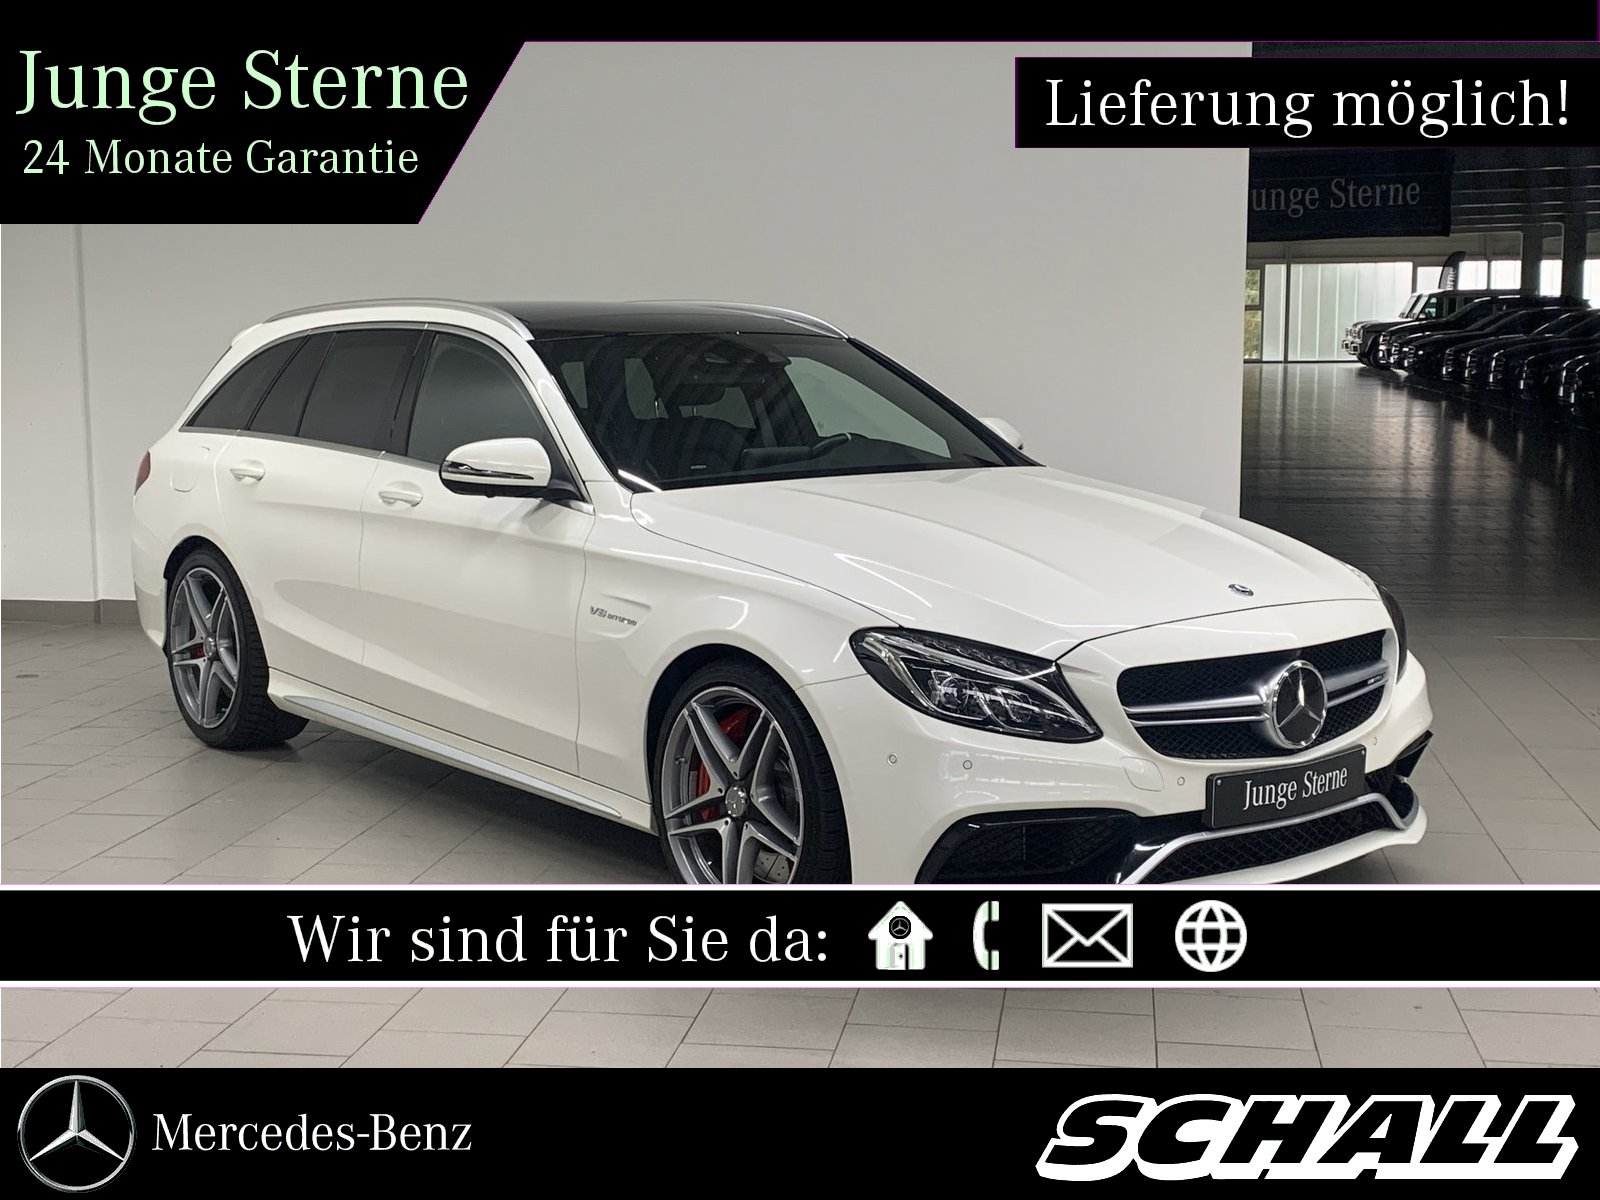 "Mercedes-Benz C 63 S T AMG+PANO+AHK+LED+COMAND+360°+19""AMG, Jahr 2017, petrol"